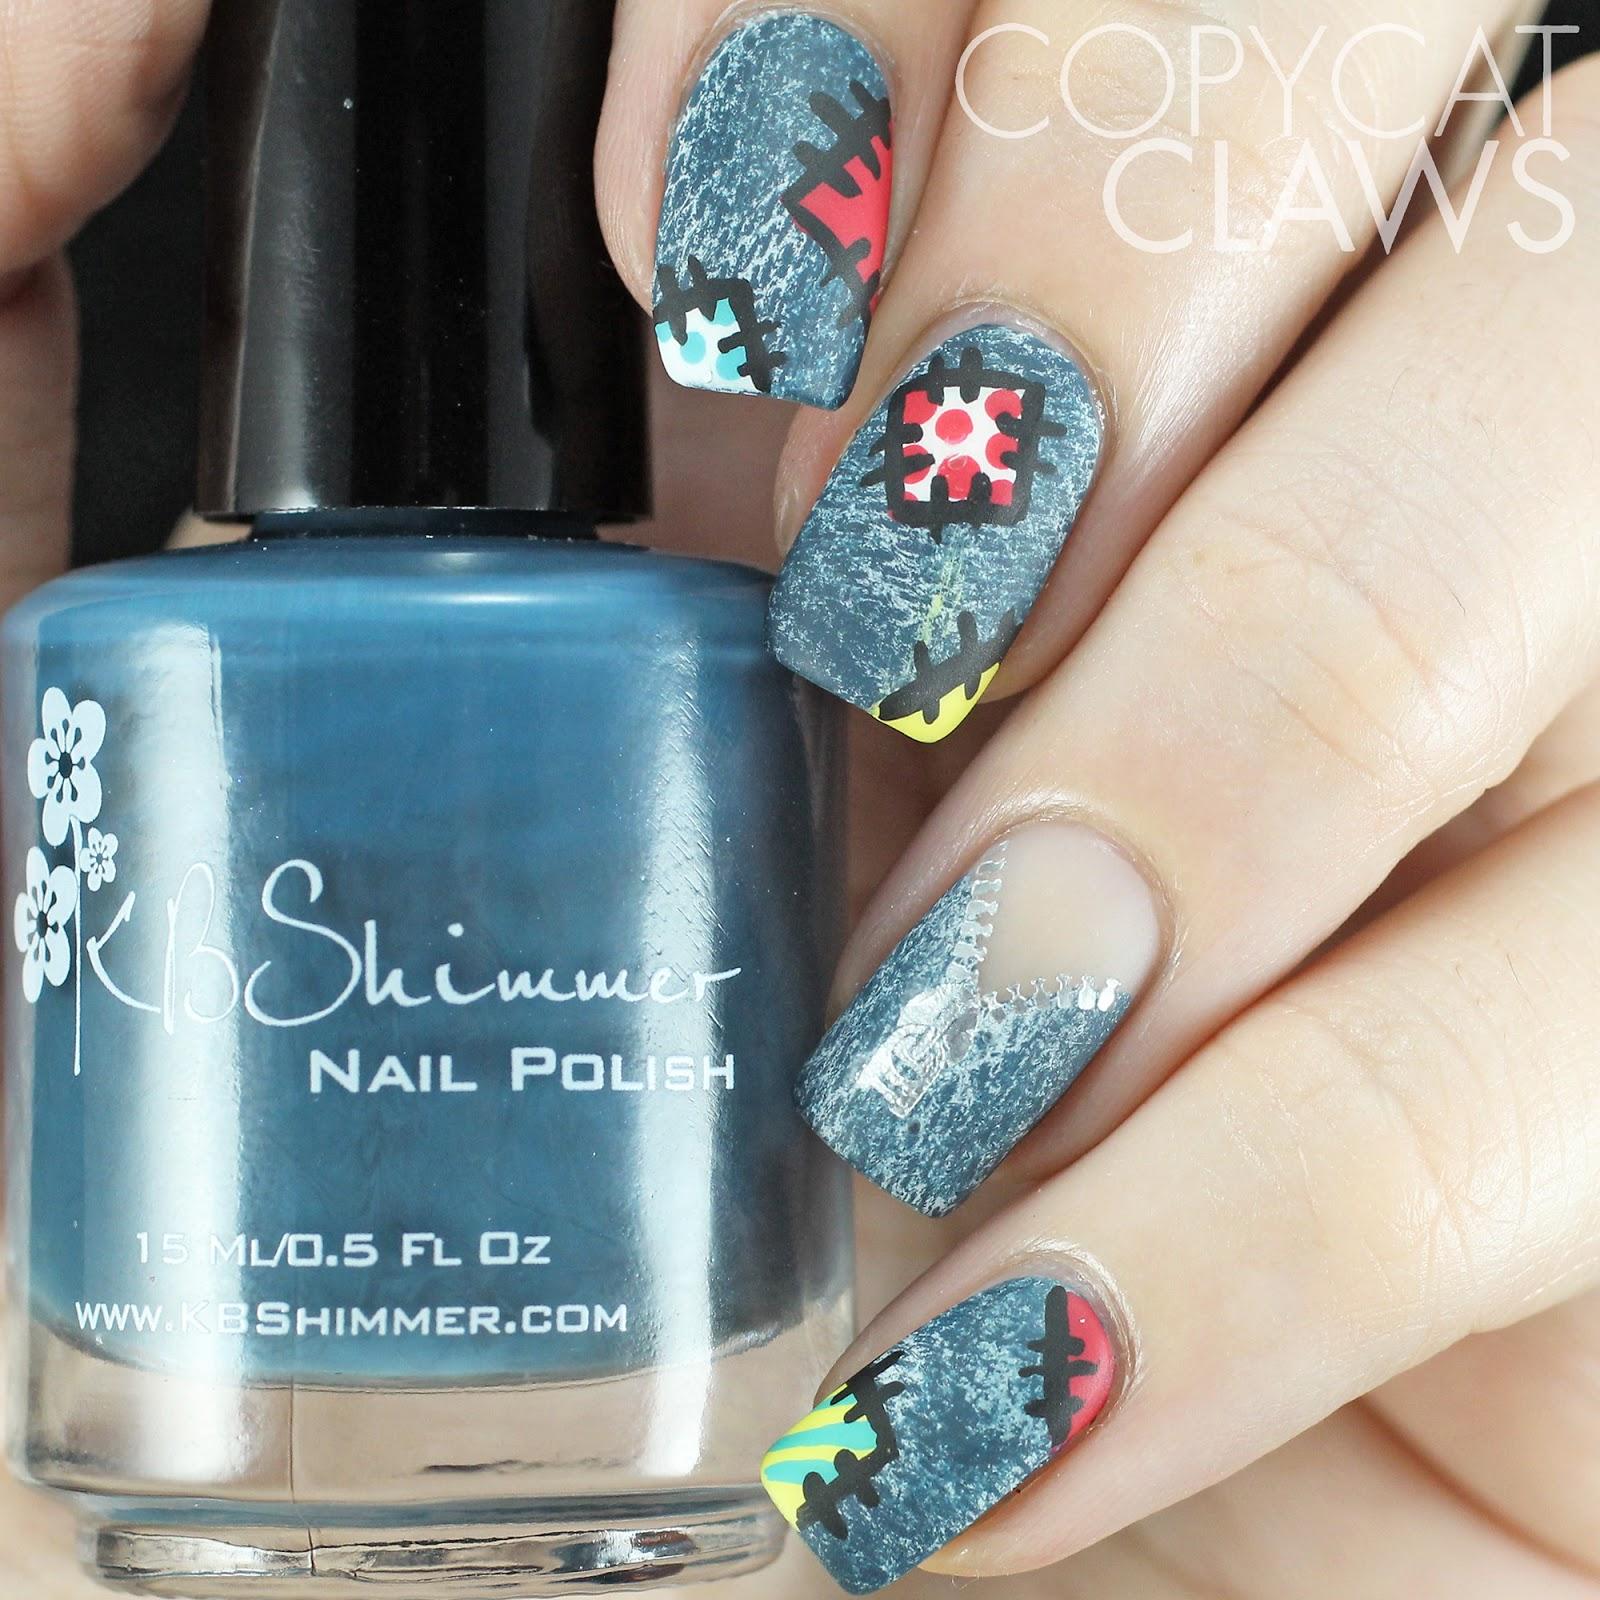 Copycat Claws Blue Color Block Nail Art: Copycat Claws: Patchwork Denim Nail Art